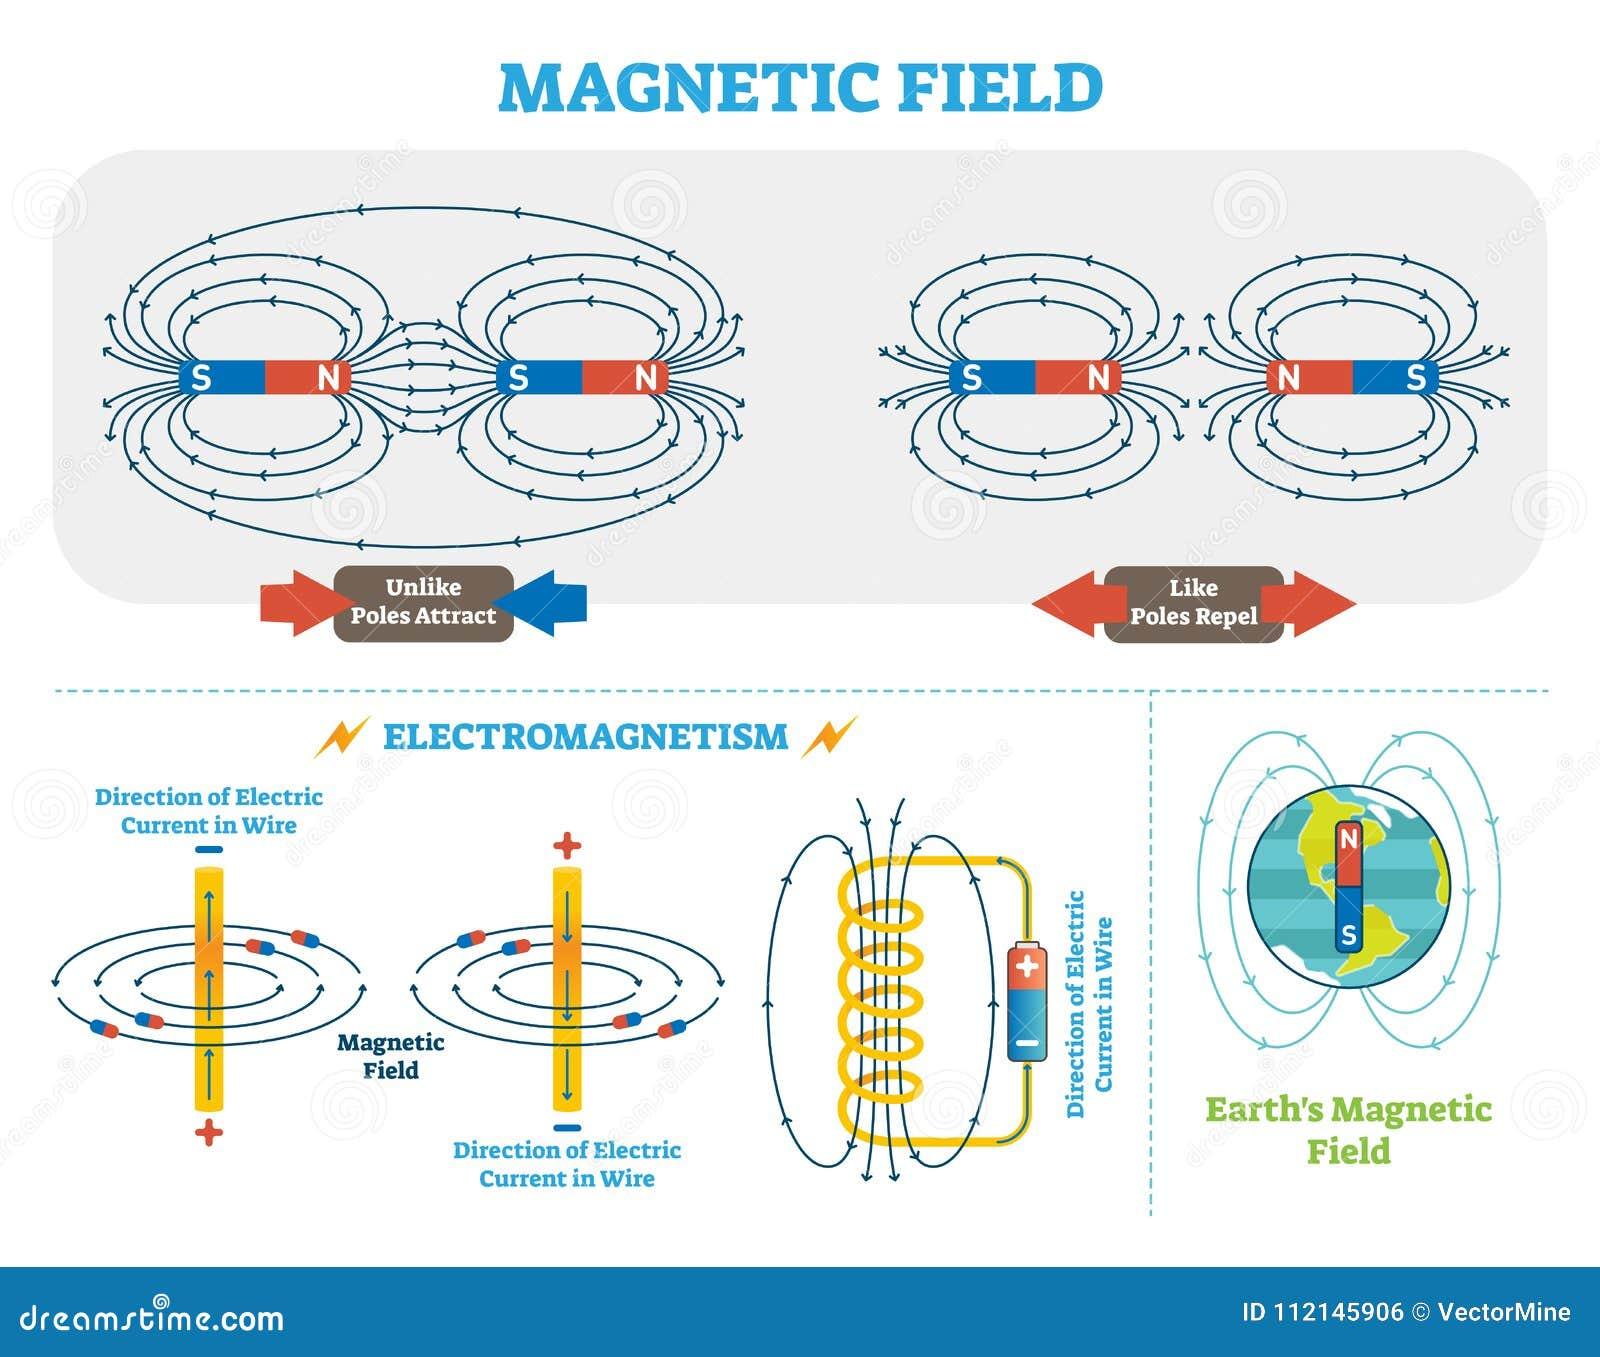 Electromagnetism Stock Illustrations  U2013 440 Electromagnetism Stock Illustrations  Vectors